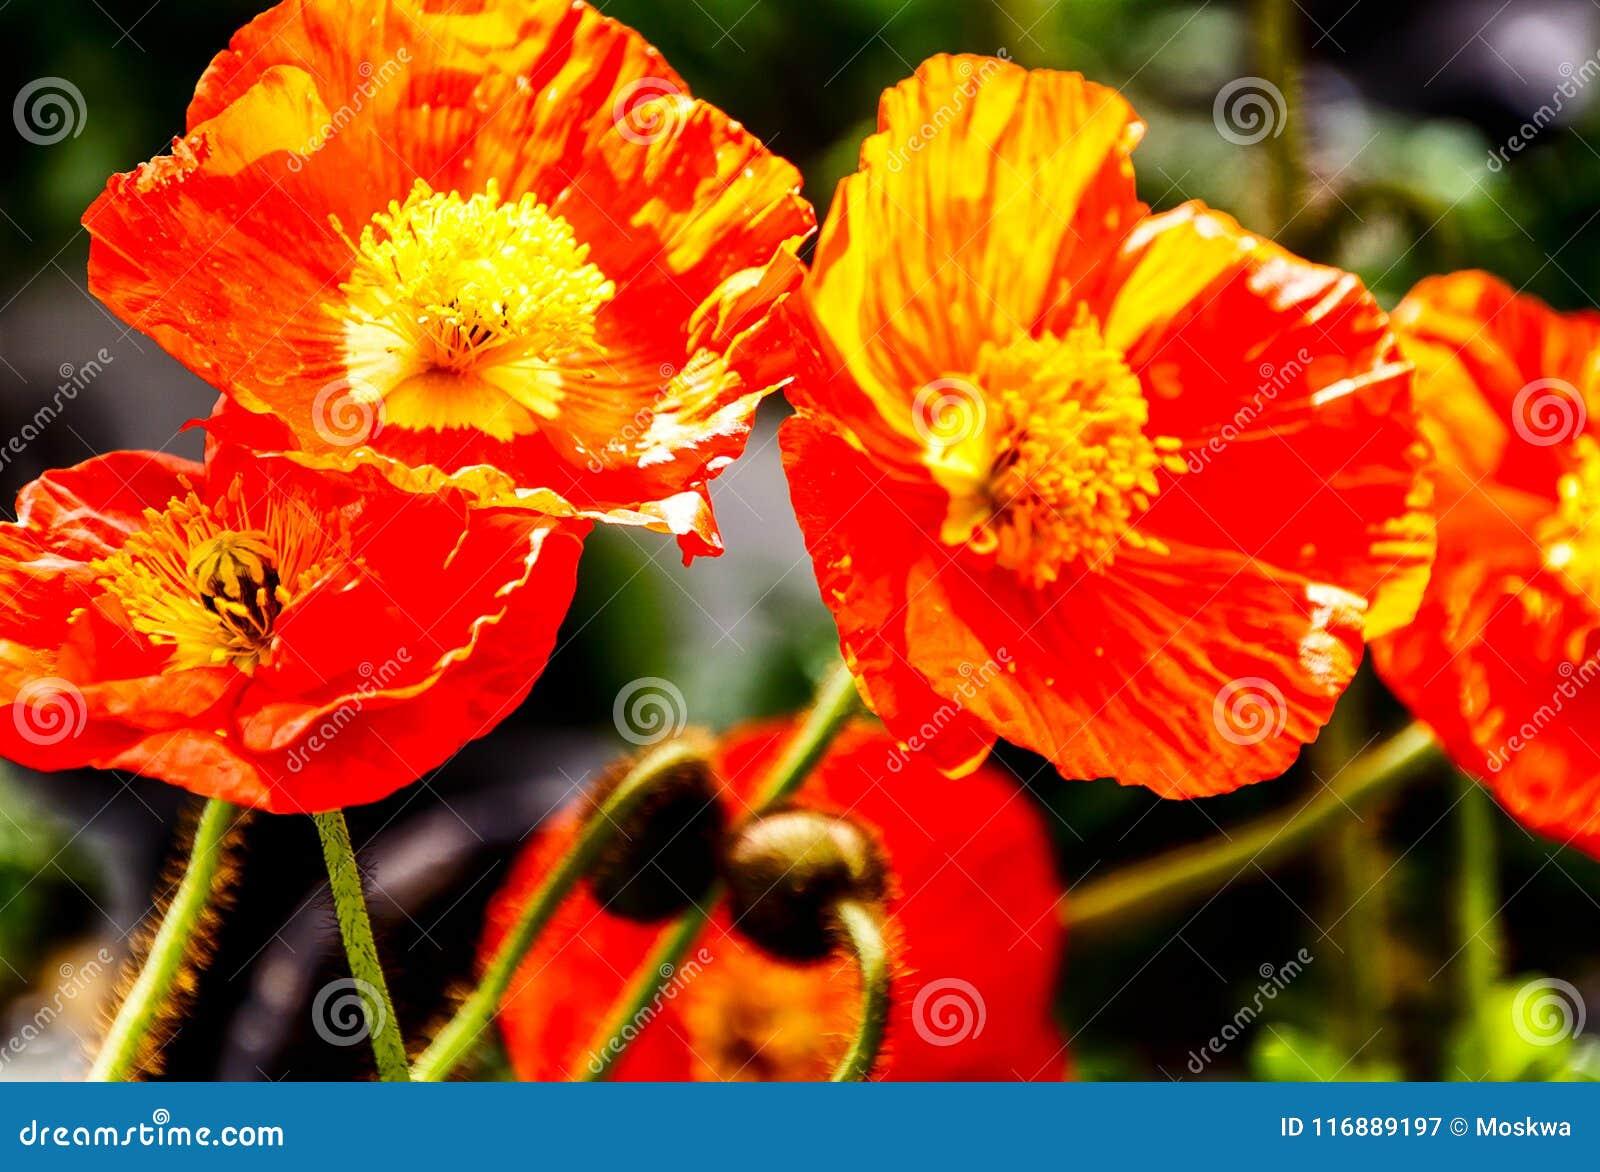 Papaver nudicaule the iceland poppy flowering plant stock image papaver nudicaule the iceland poppy flowering plant mightylinksfo